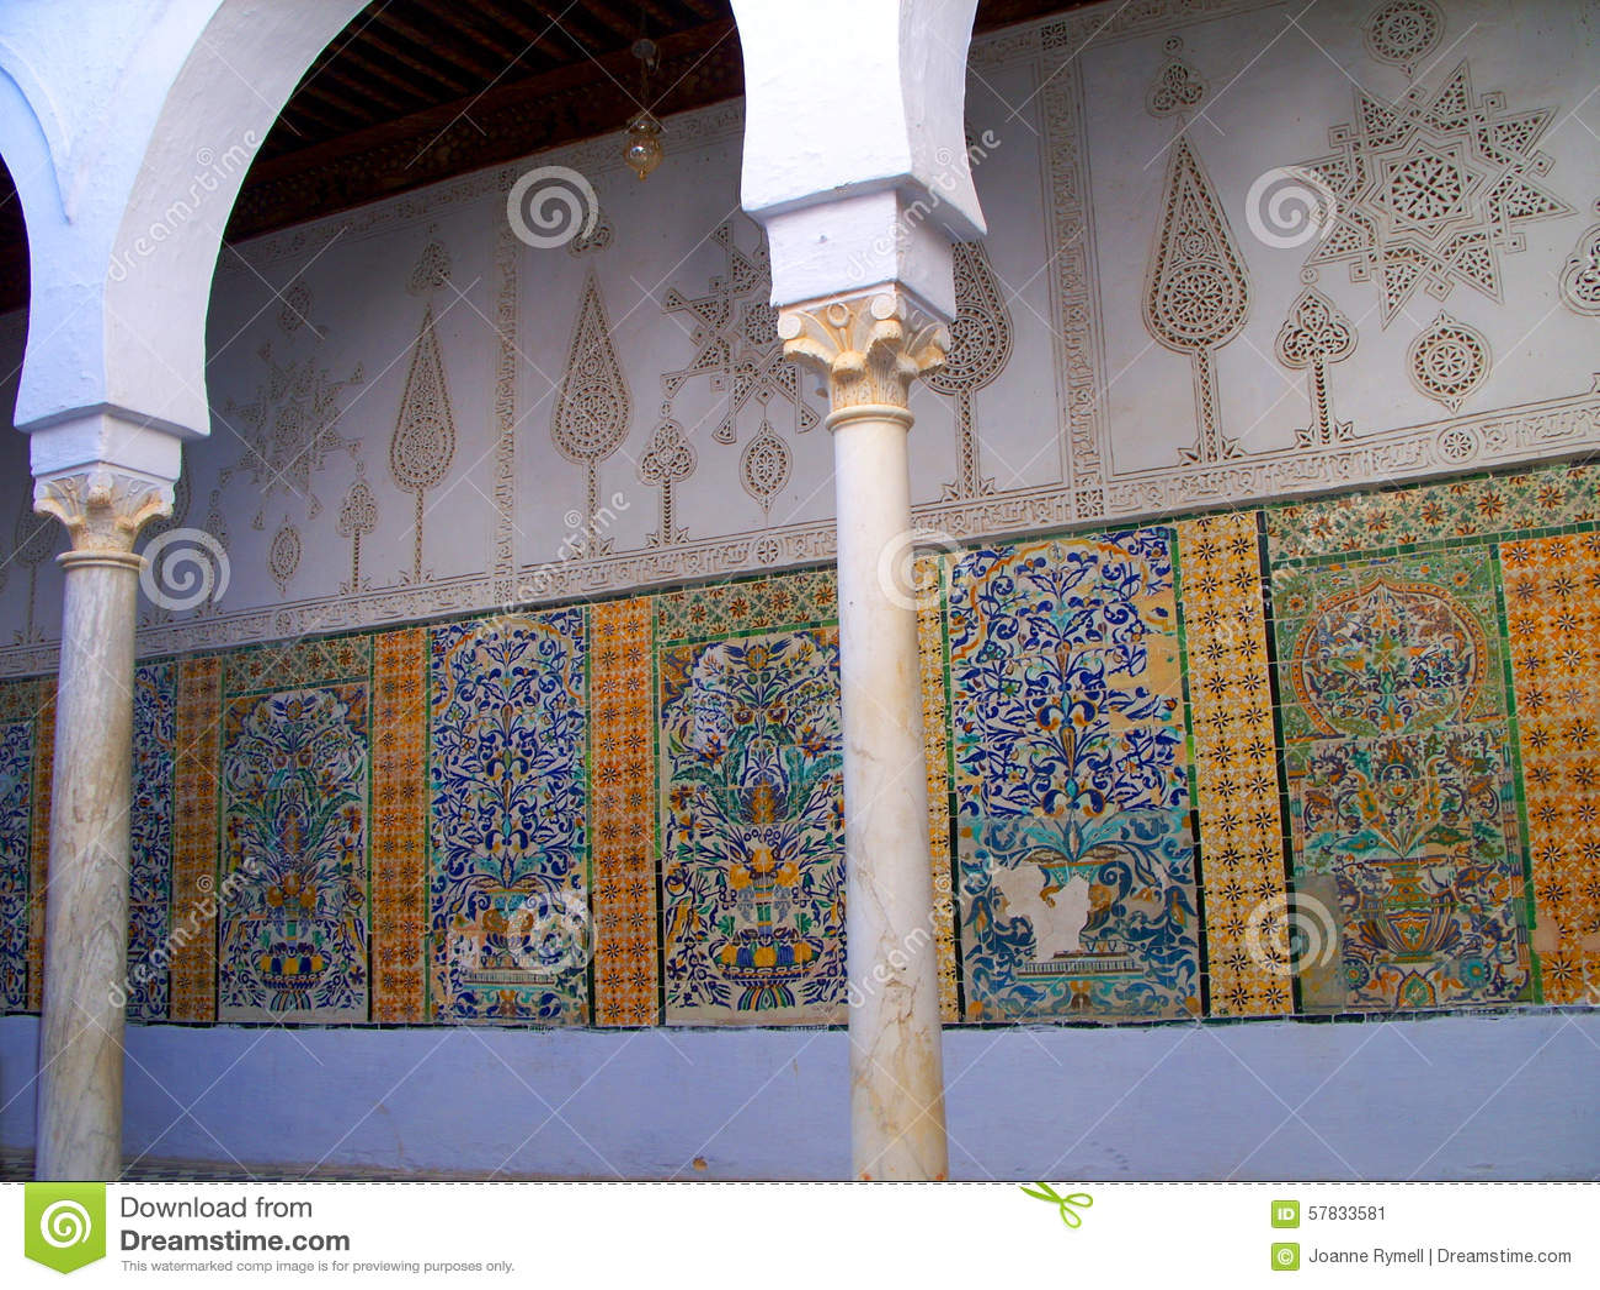 Kairouan mosque faience mosaic detail stock image image of